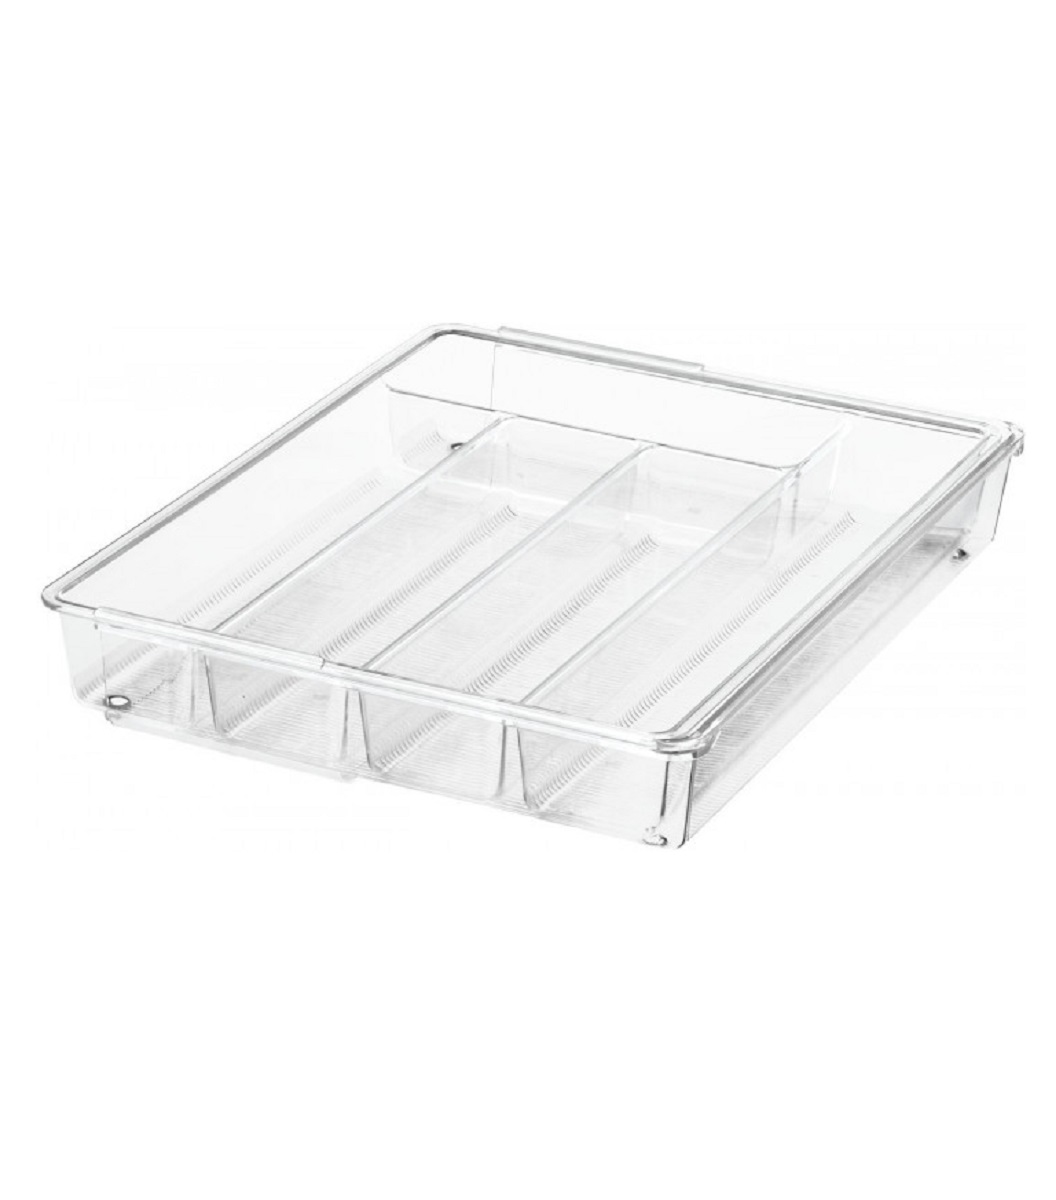 Онлайн каталог PROMENU: Органайзер для кухонных принадлежностей iDesign LINUS, 36,6х28,7х5,8 см, BPA-free пластик, прозрачный                                   57430EU